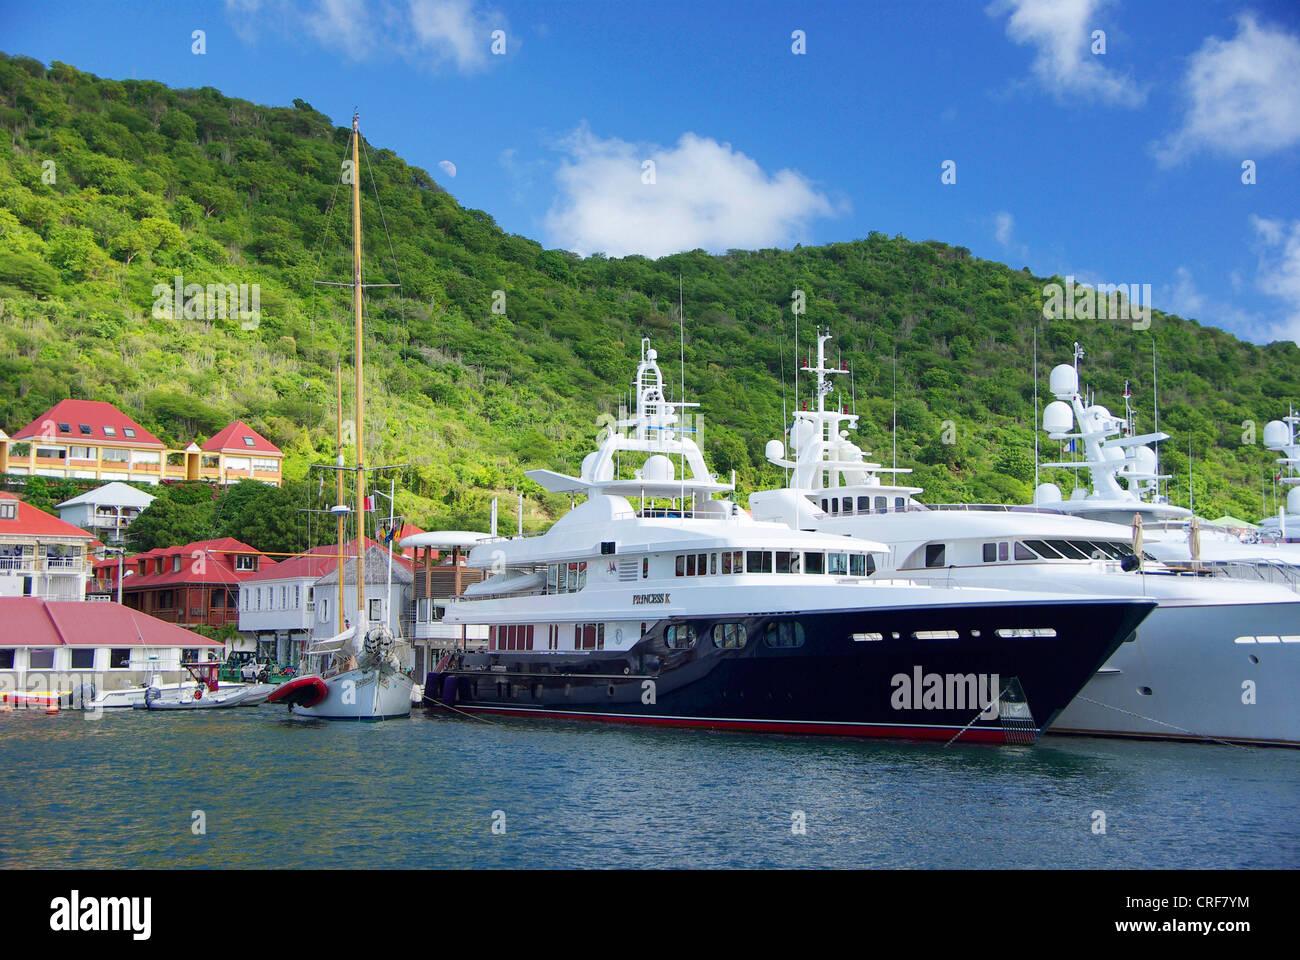 Barth, Gustavia, Franzoesiche Antillen, Saint-Barthlmy Foto de stock